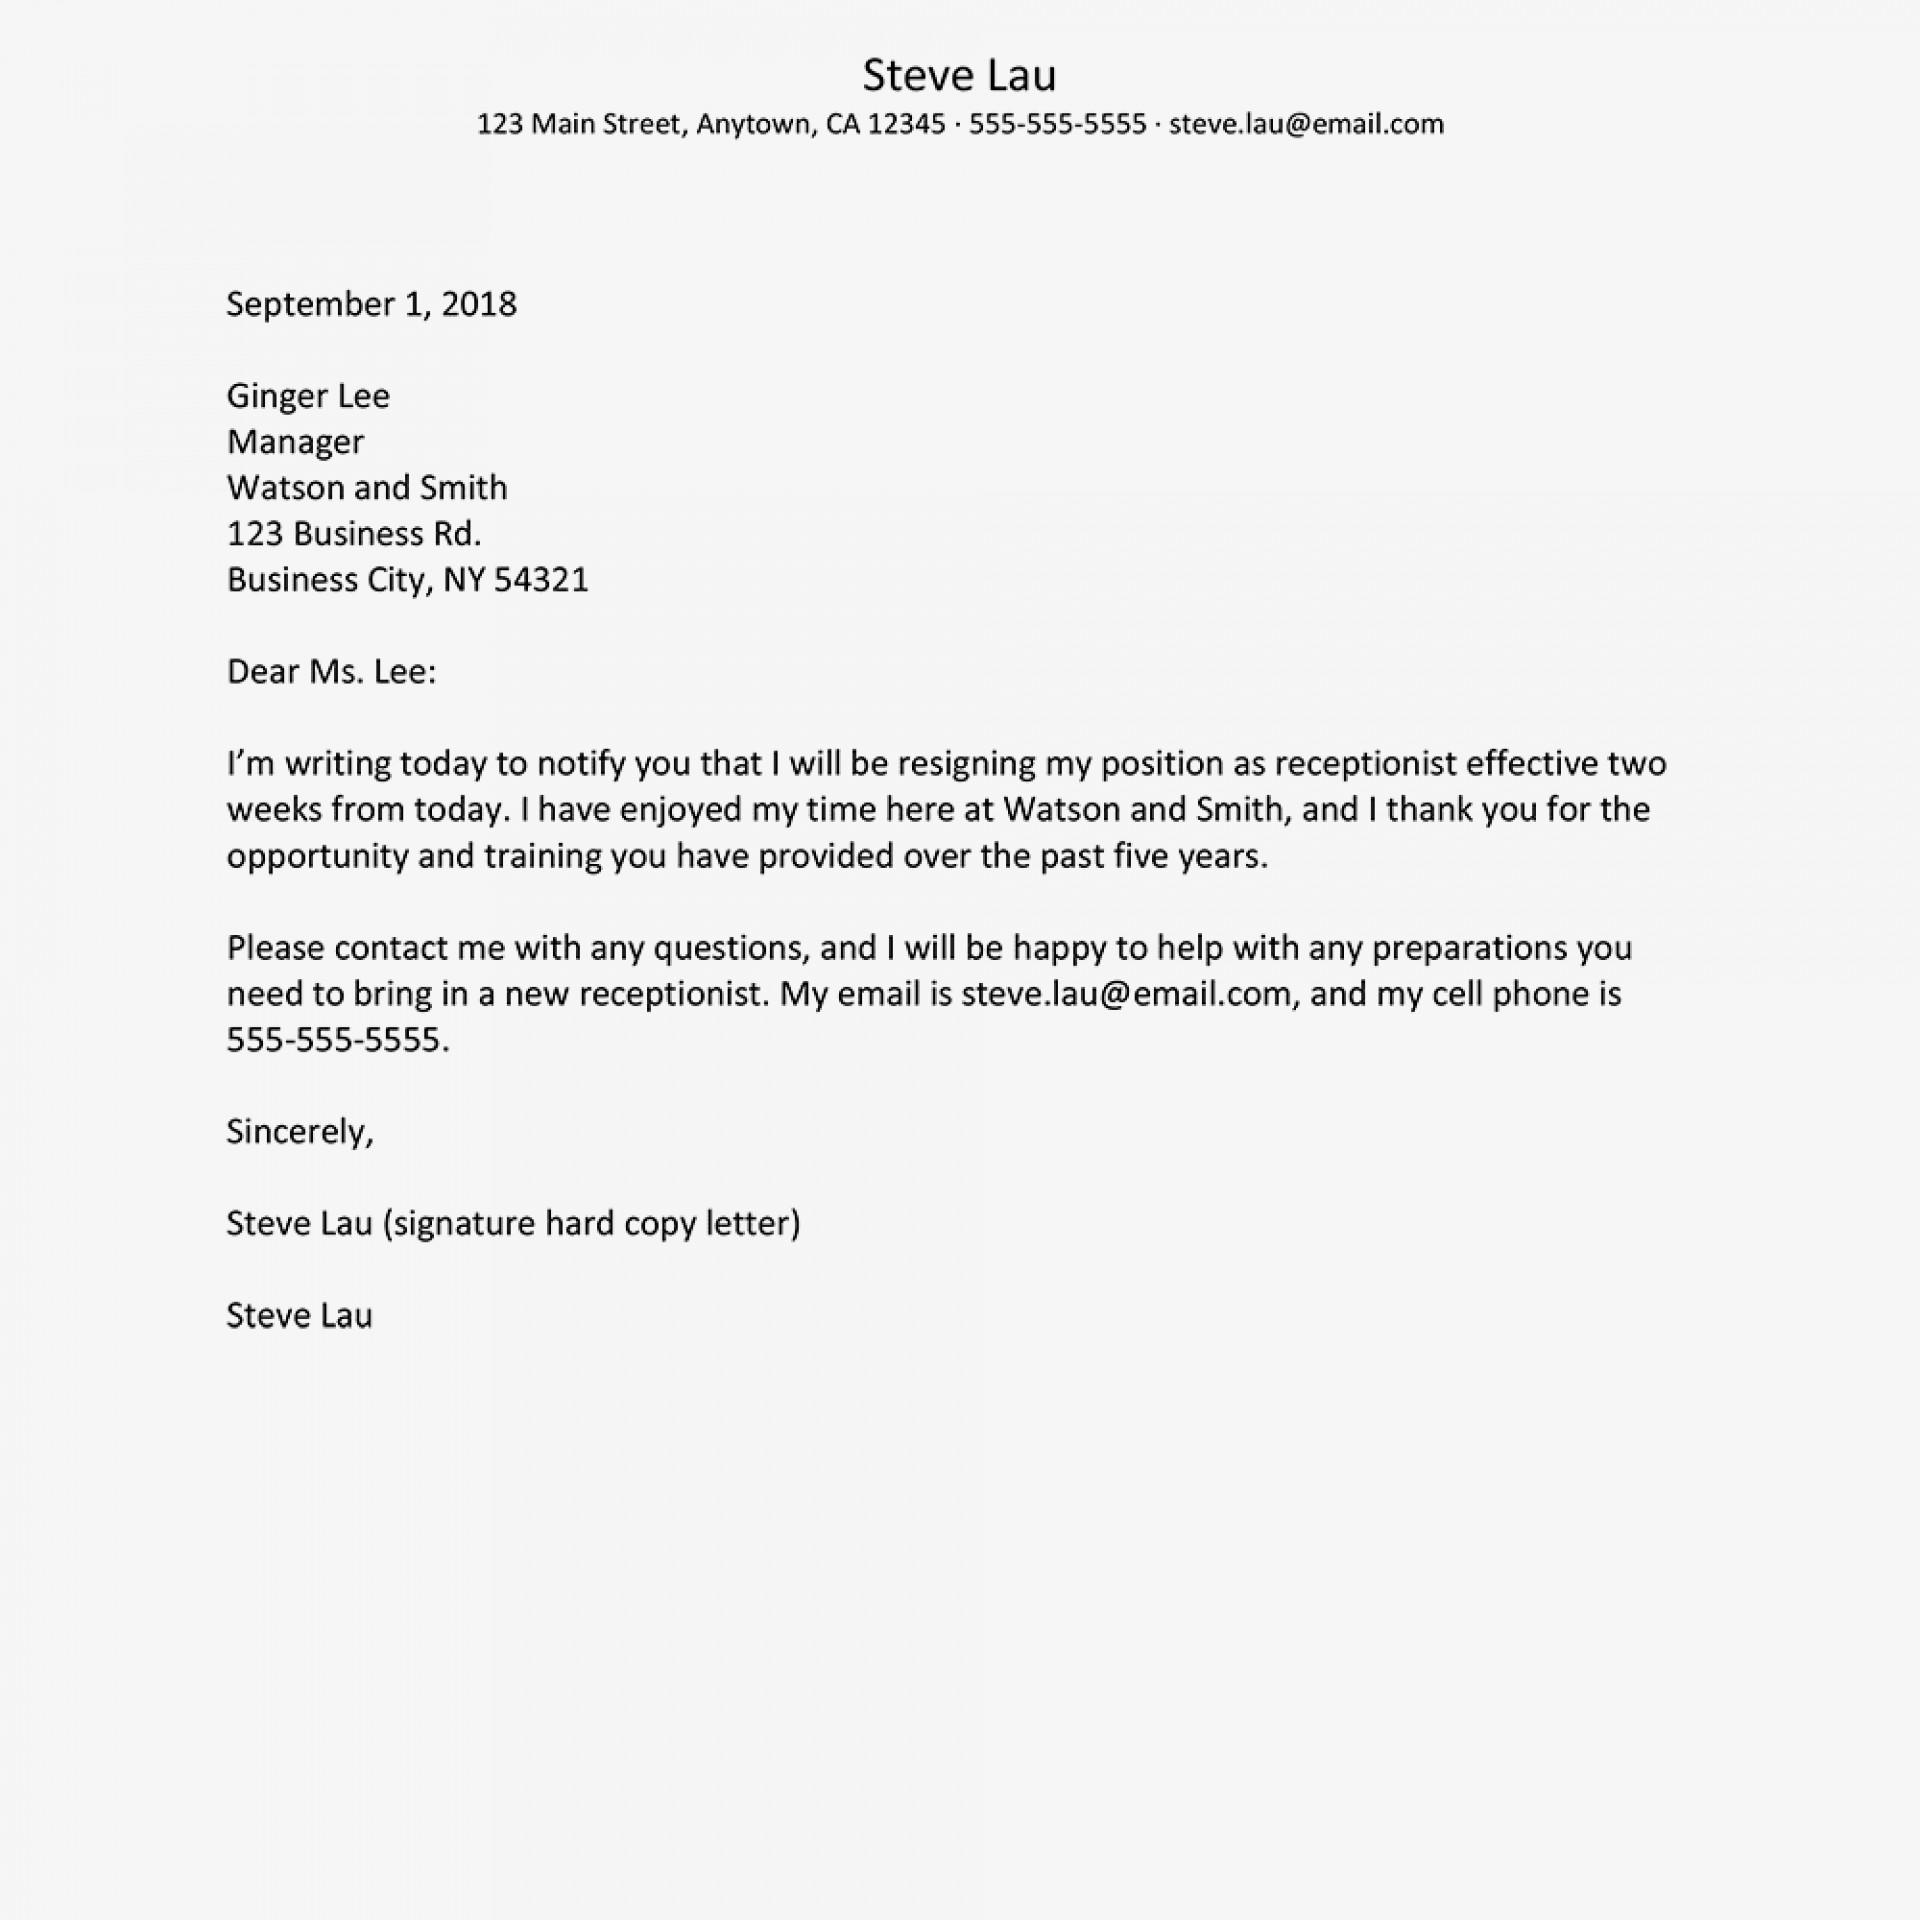 003 Singular 2 Week Notice Template Word High Resolution  Free Microsoft1920